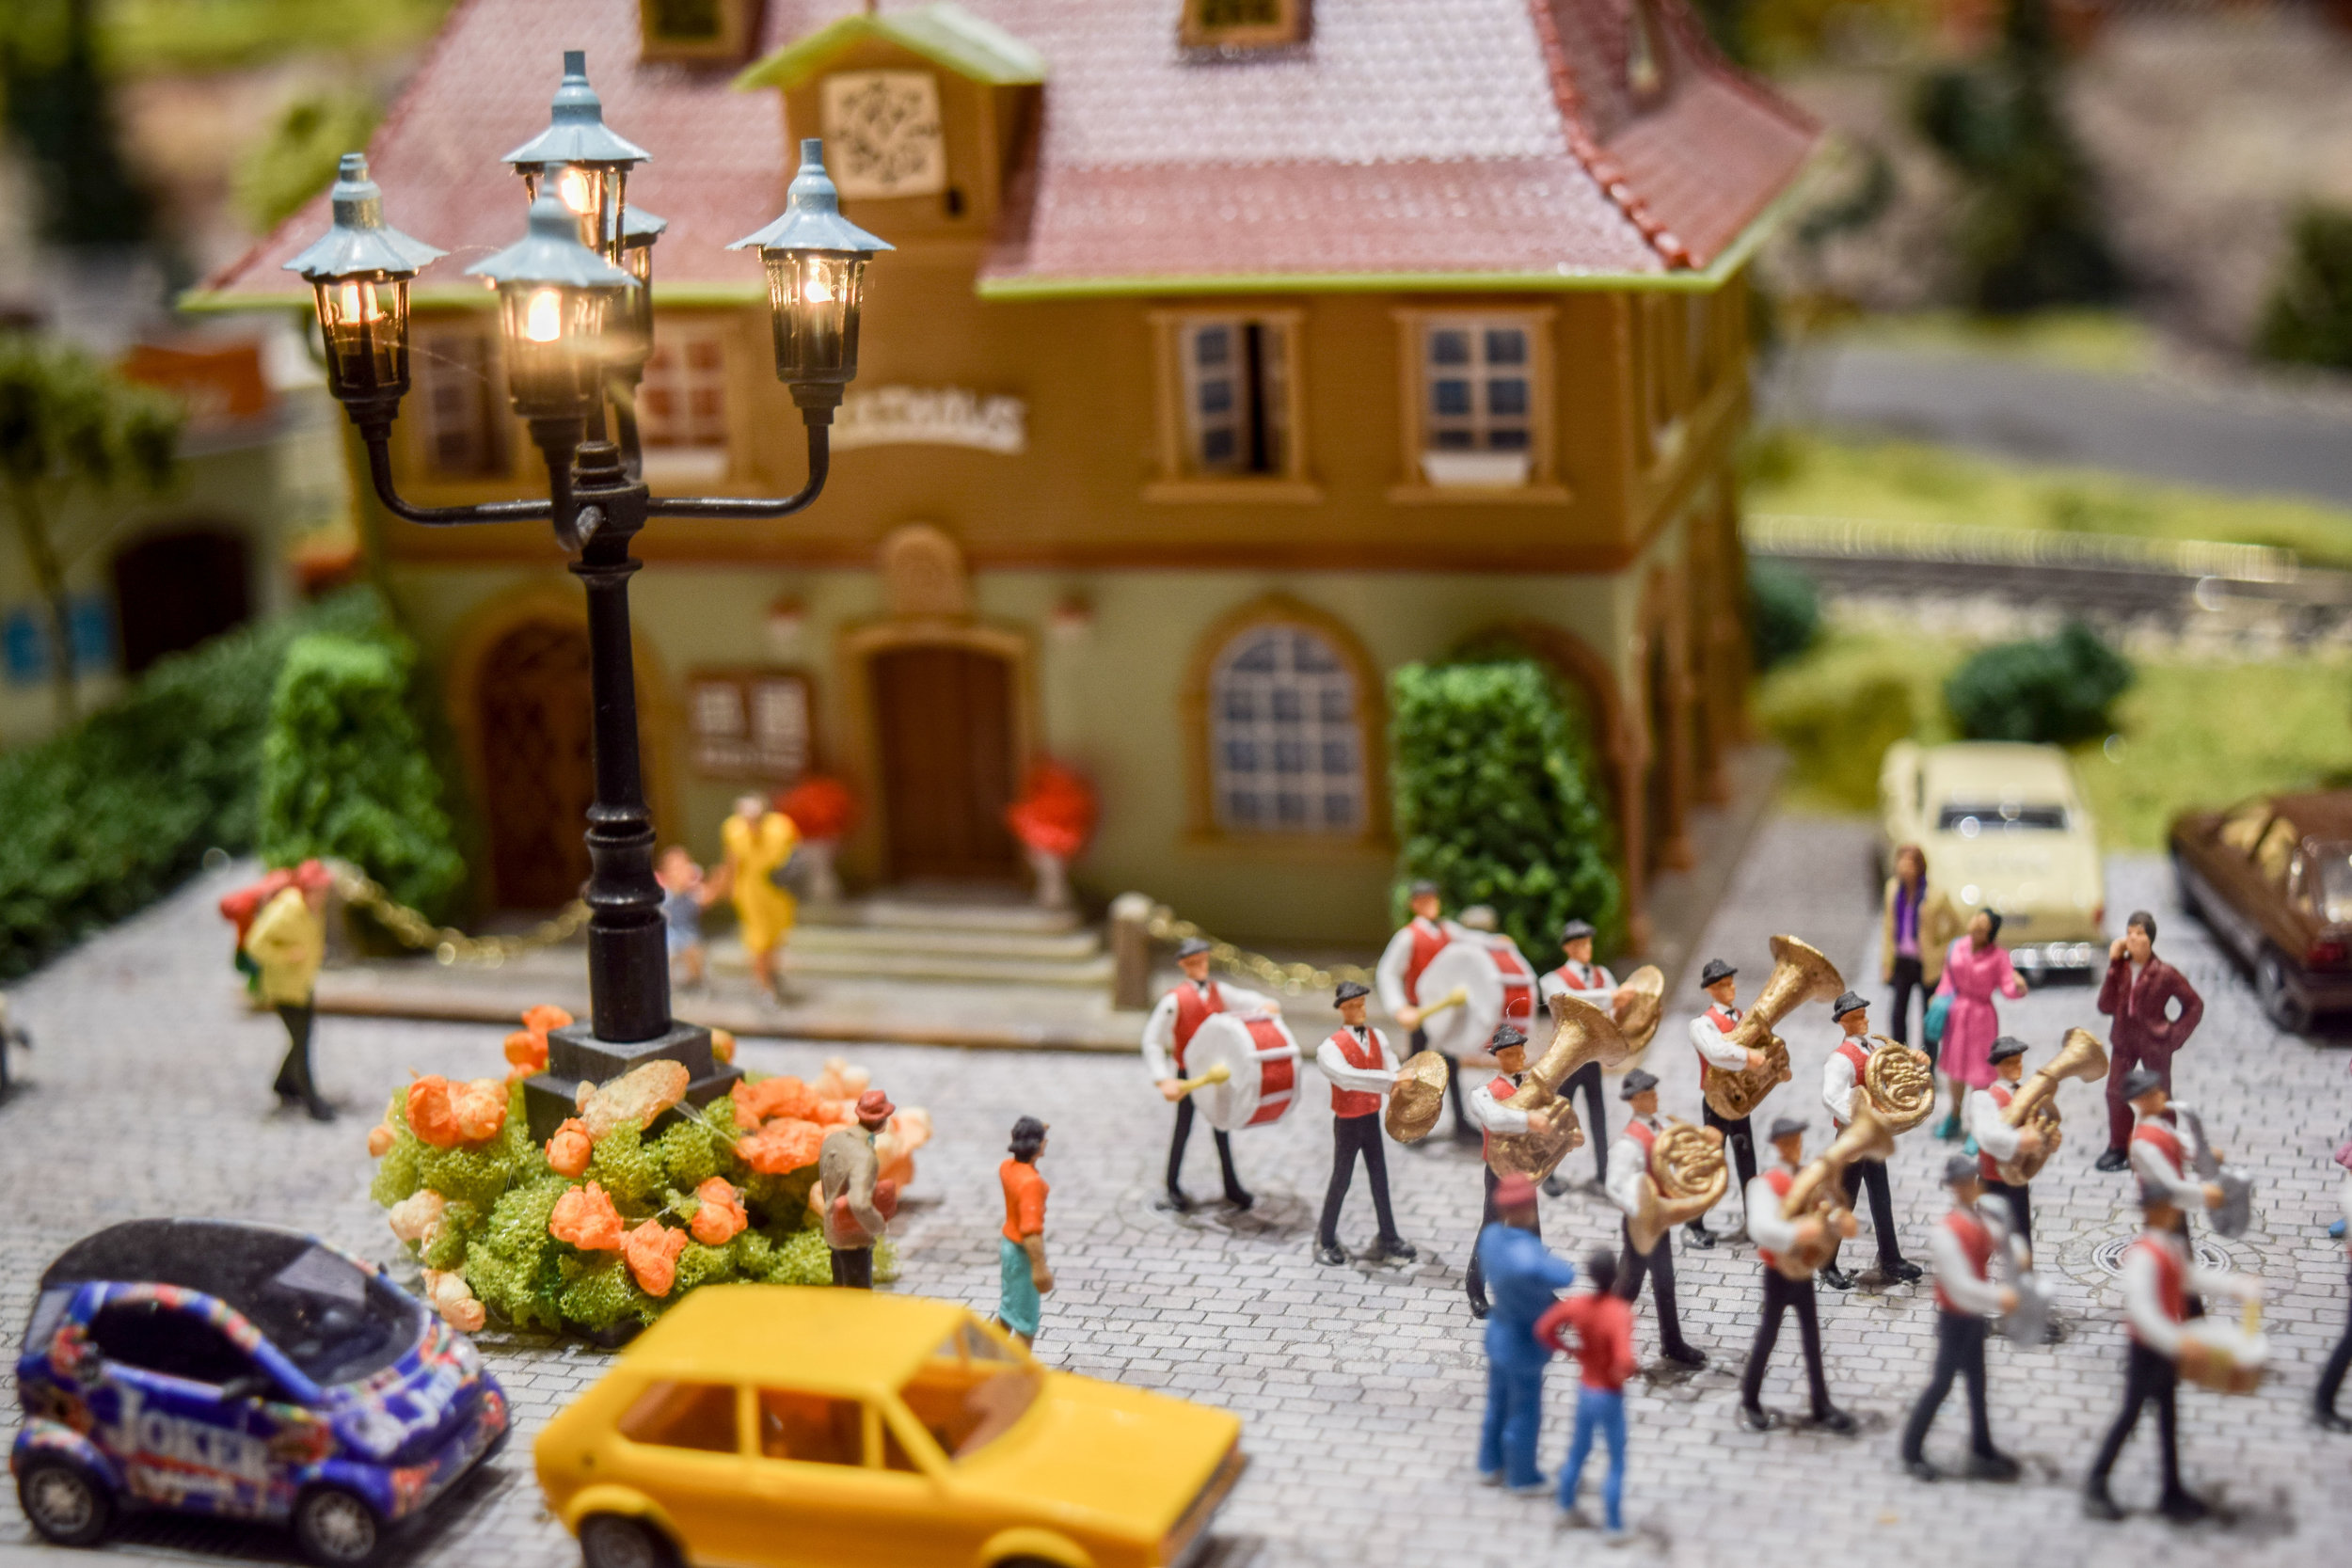 Miniature European marching band